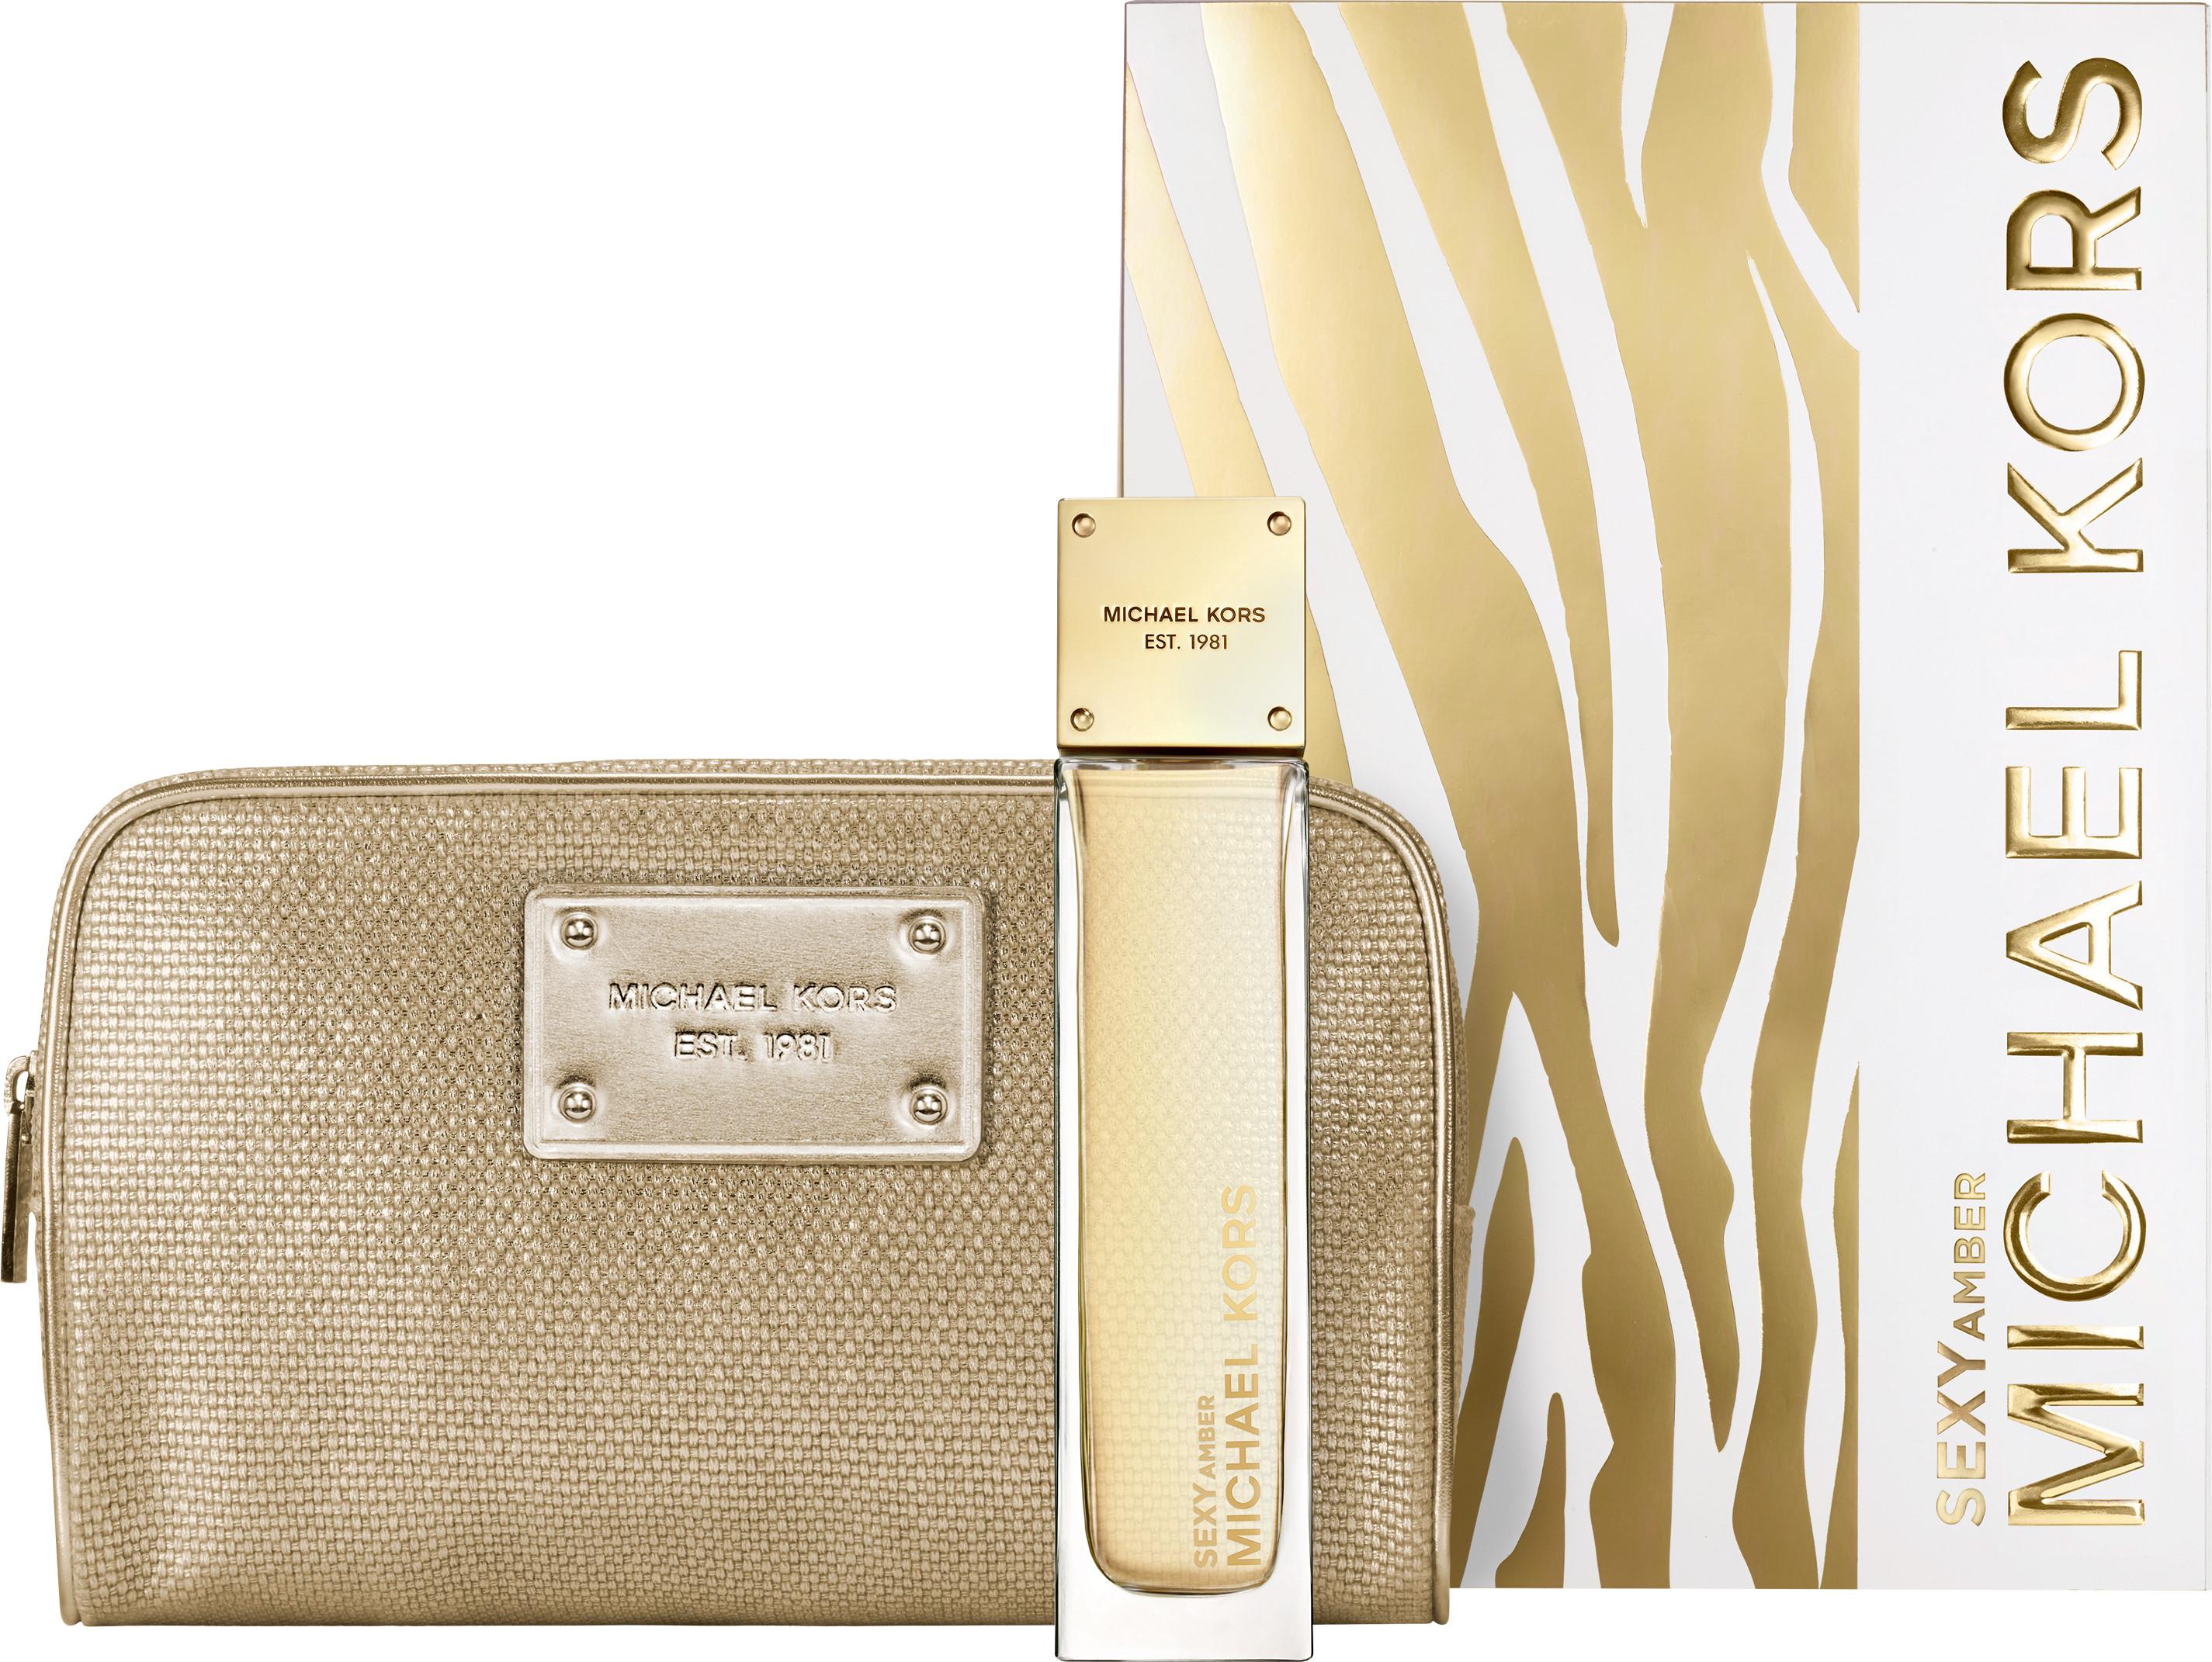 Michael Kors Sexy Amber Eau de Parfum Spray 100ml Gift Set £30.75 delivered w/code @ Escentual